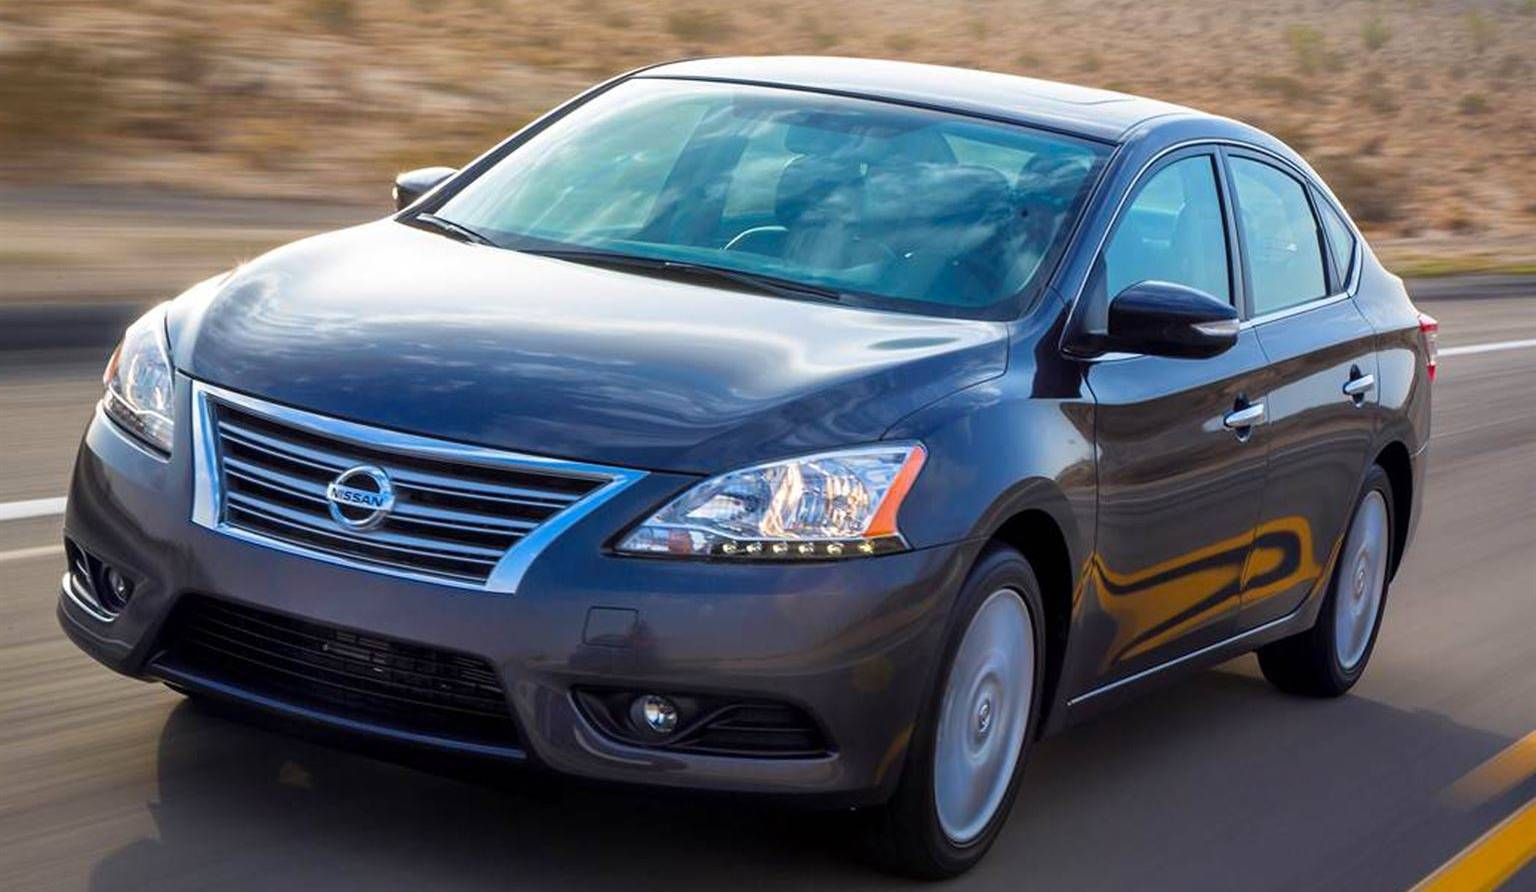 60 000 Nissan rappelees au Canada